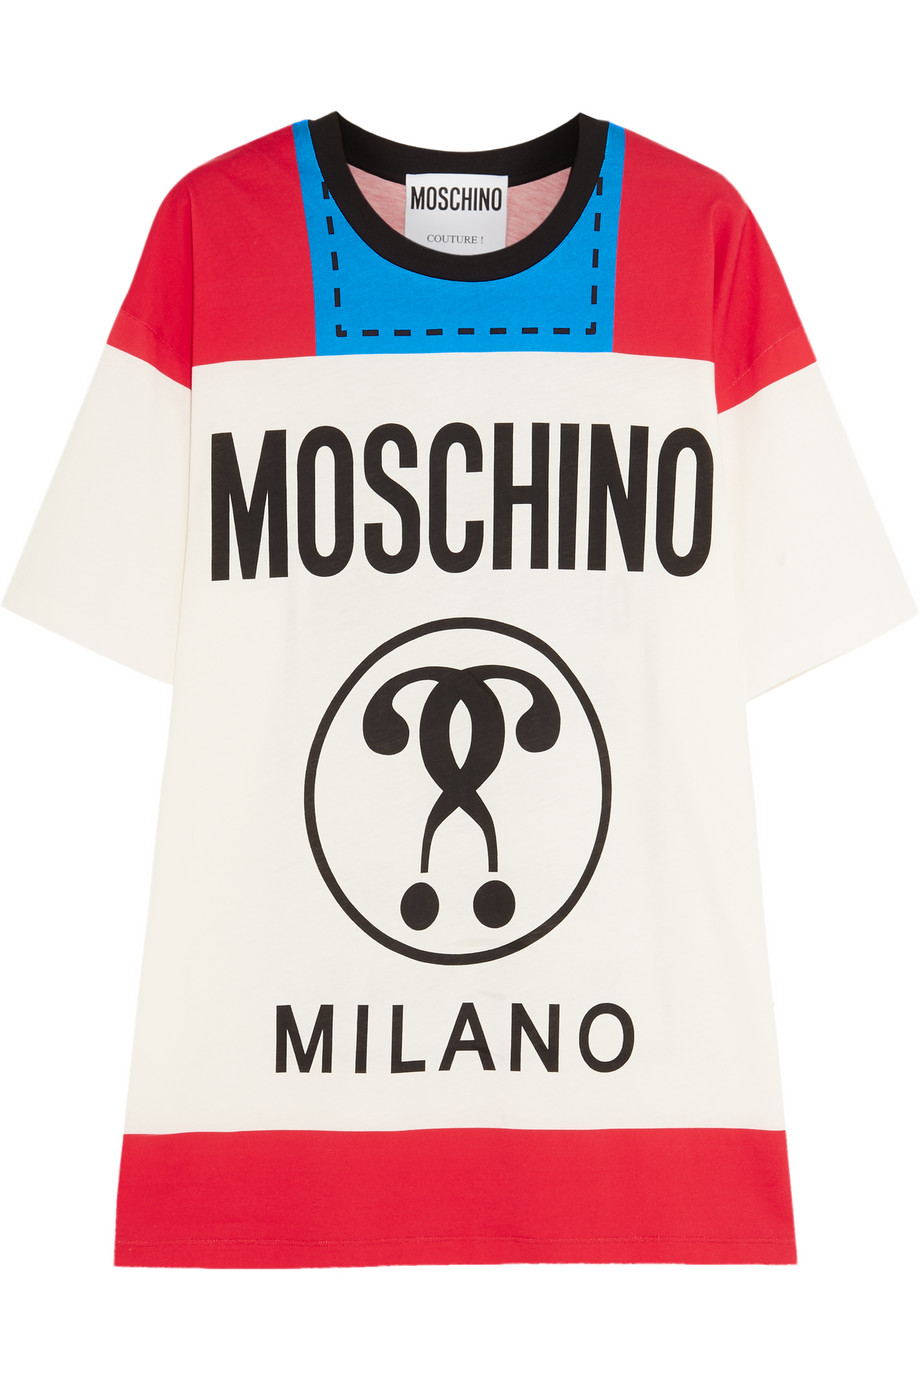 Moschino Printed Cotton-Jersey T-Shirt, Red, Women's